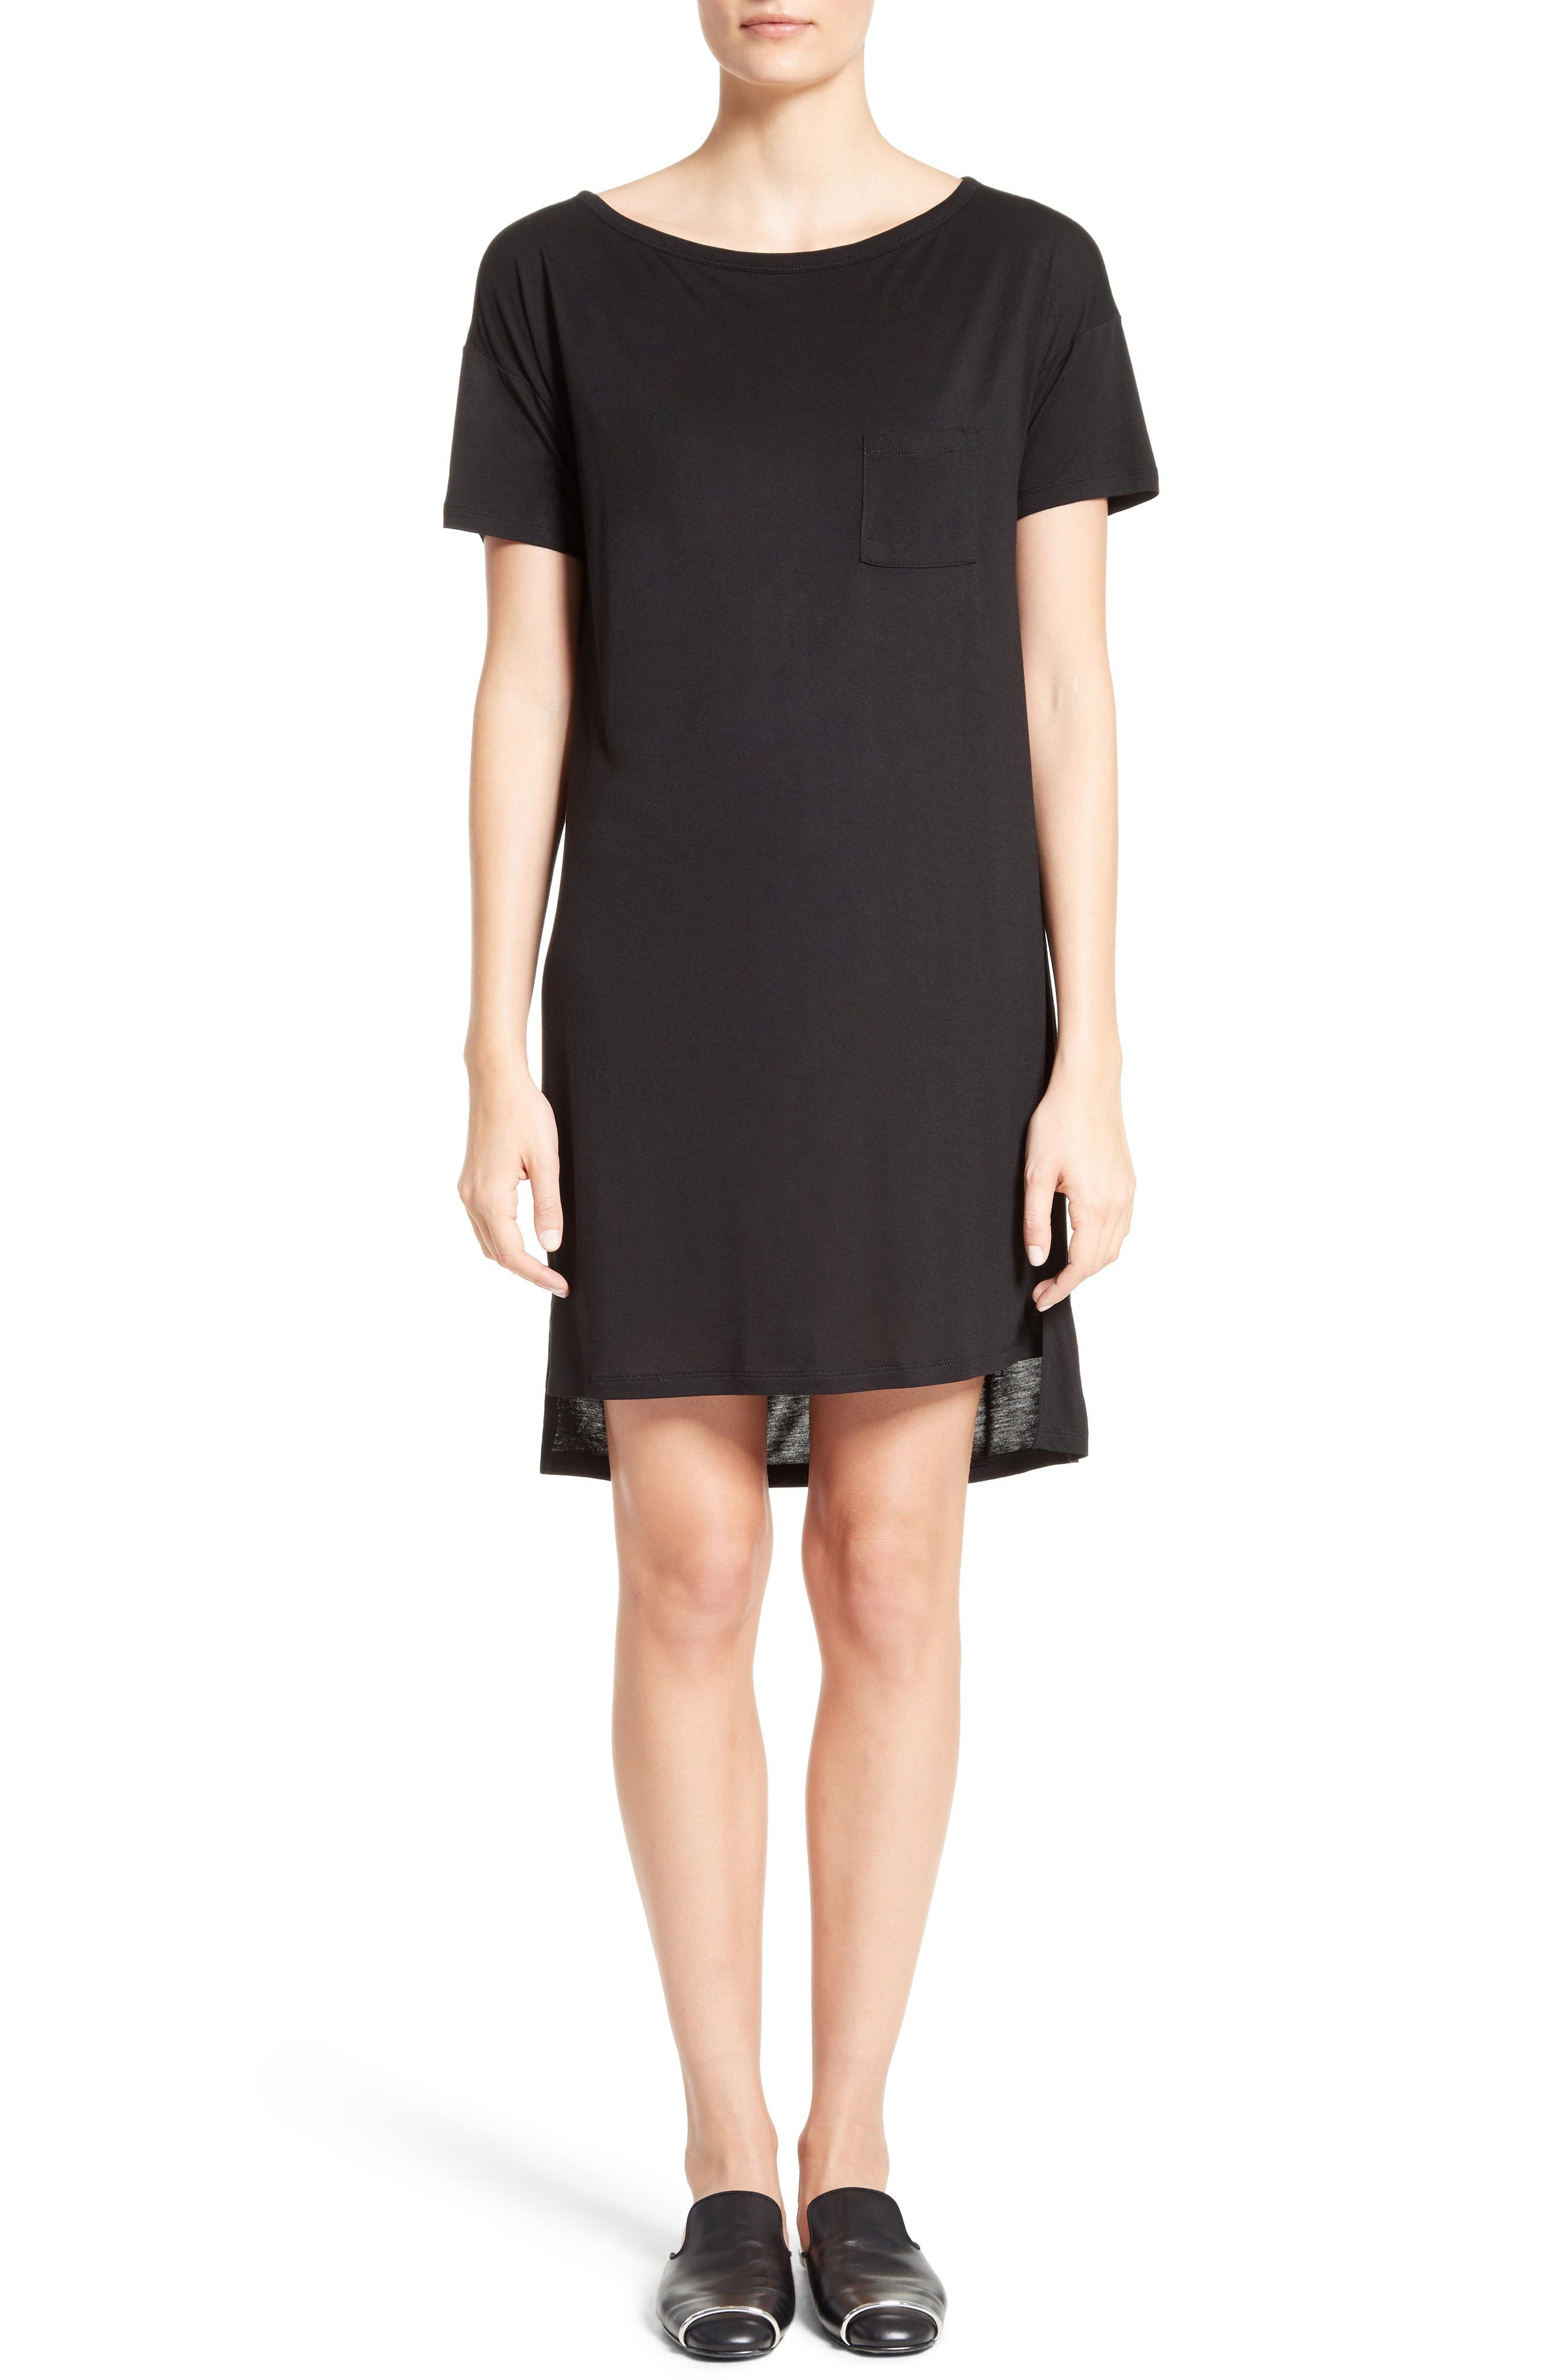 Alternate Image 1 Selected - T by Alexander Wang Boatneck T-Shirt Dress